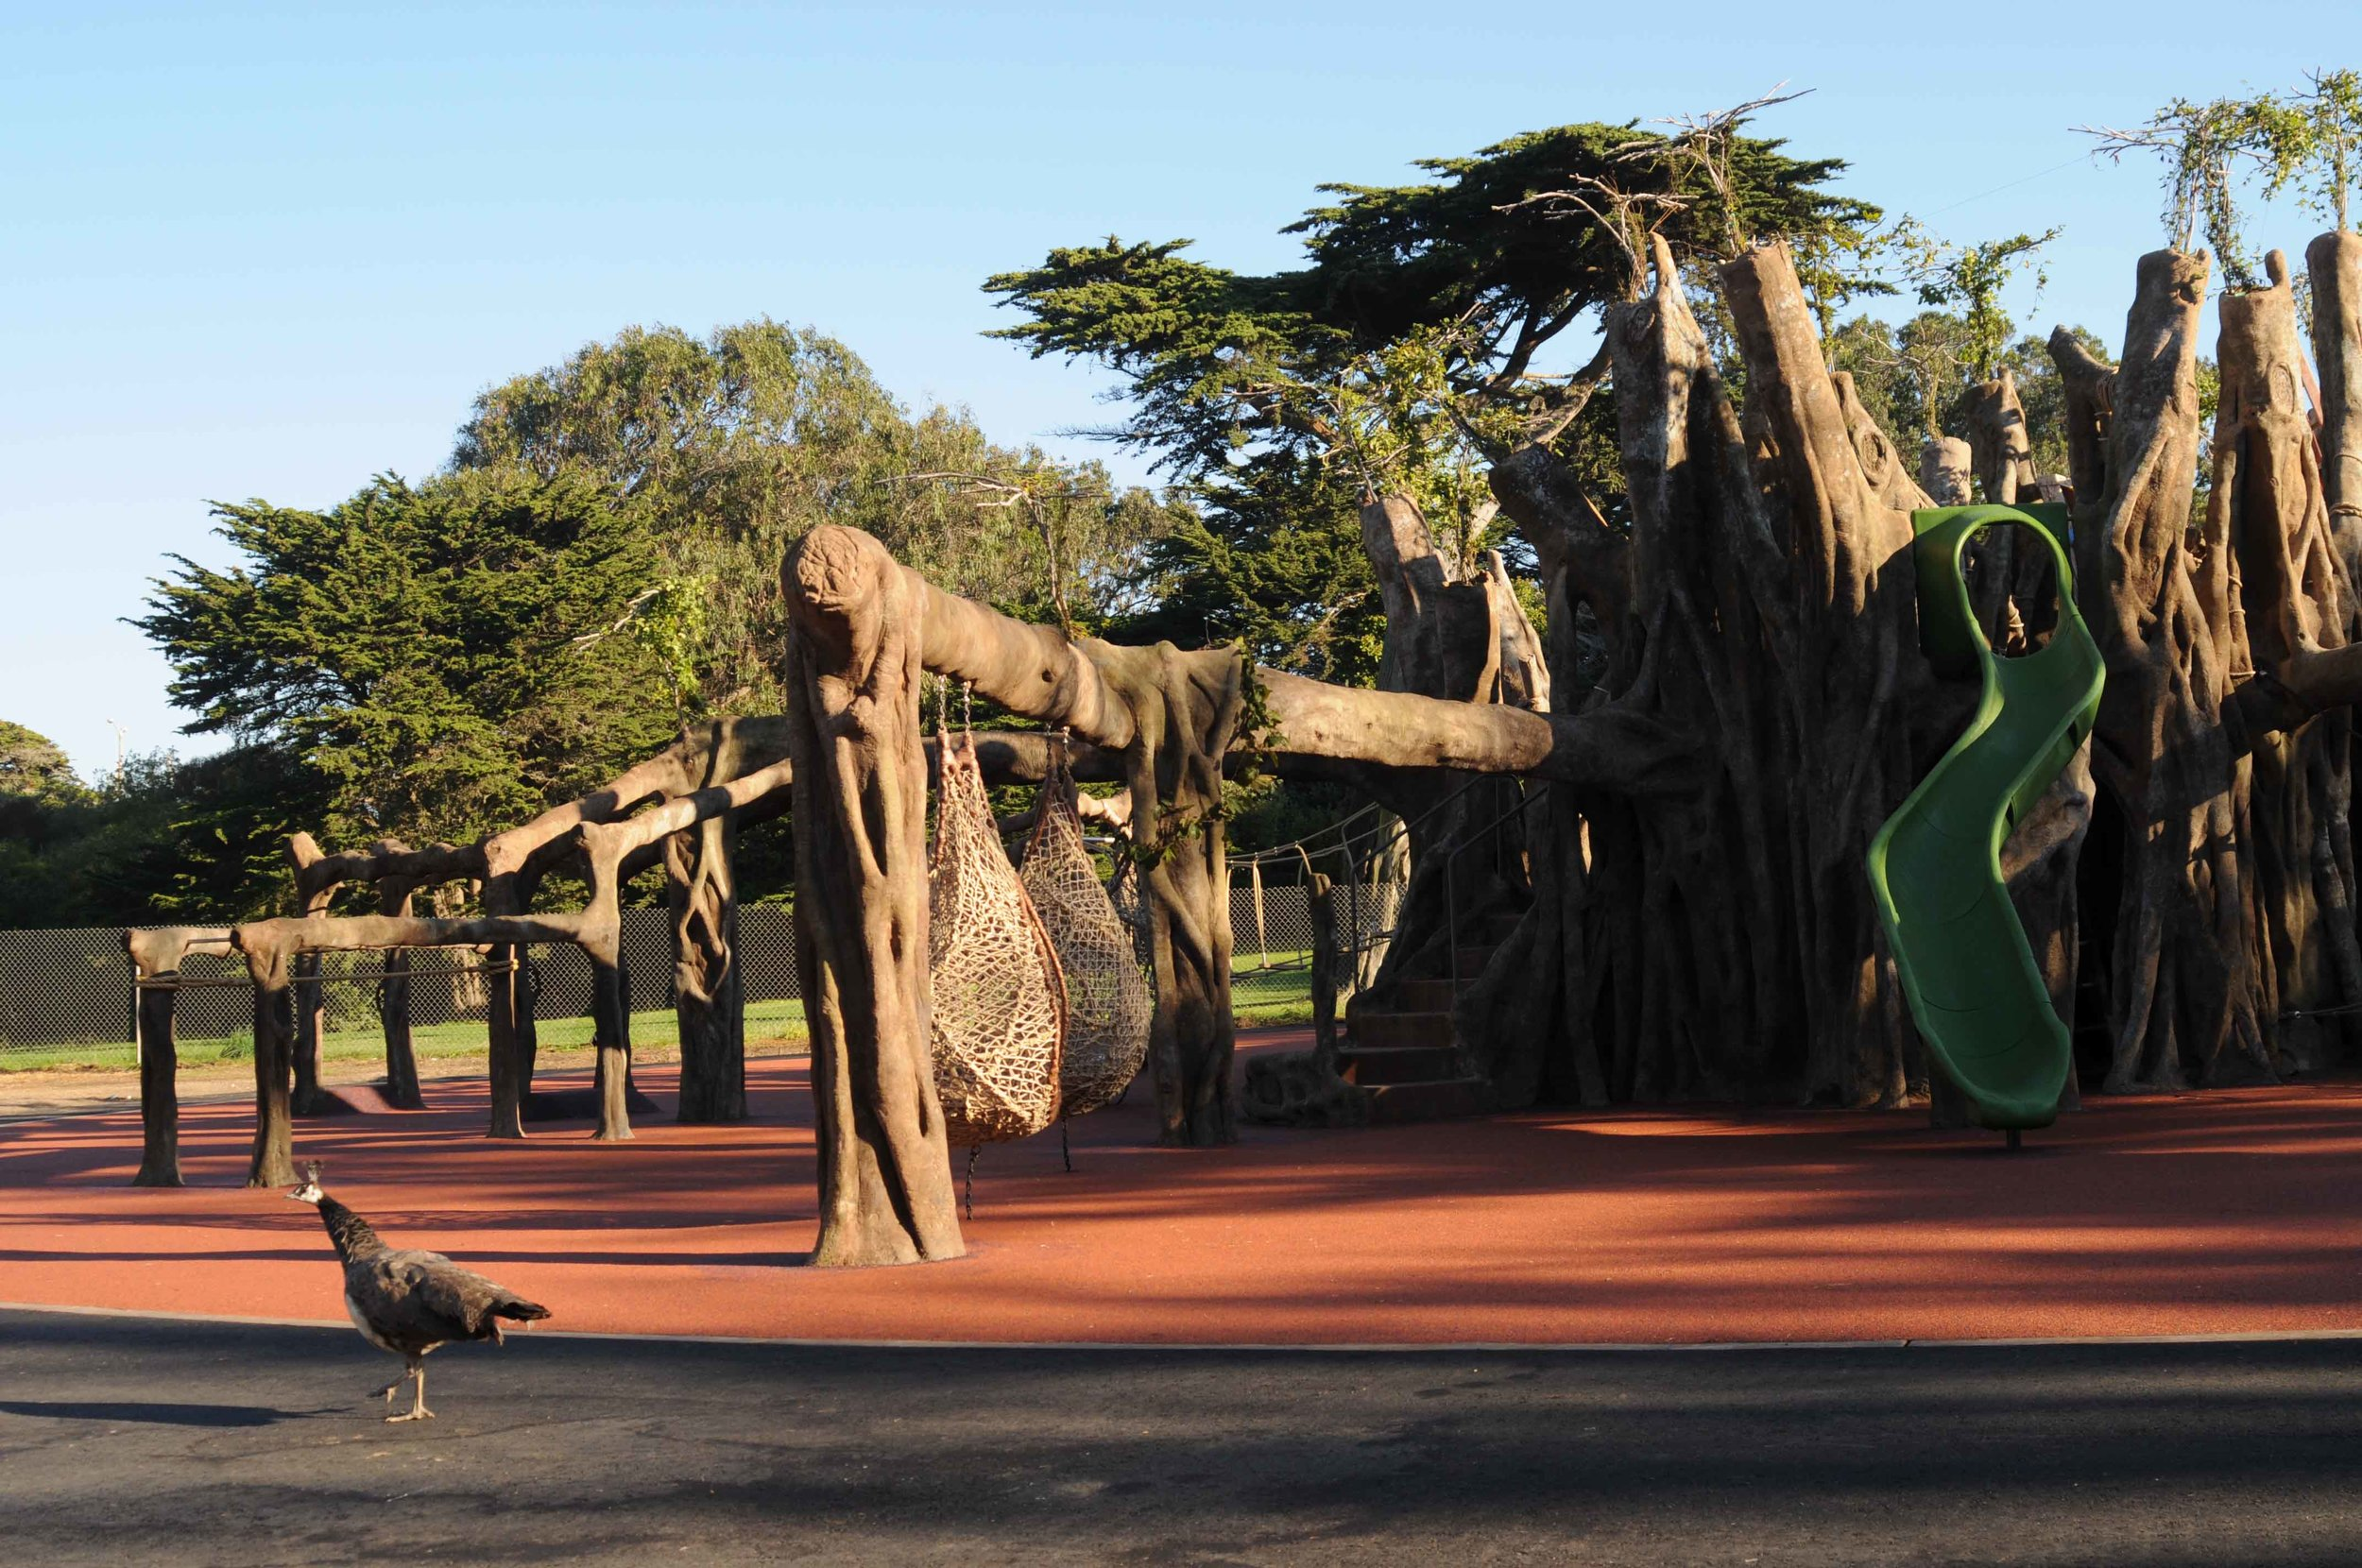 SF Zoo.Playground.Banyon Tree.DSC_2243.lo.jpg